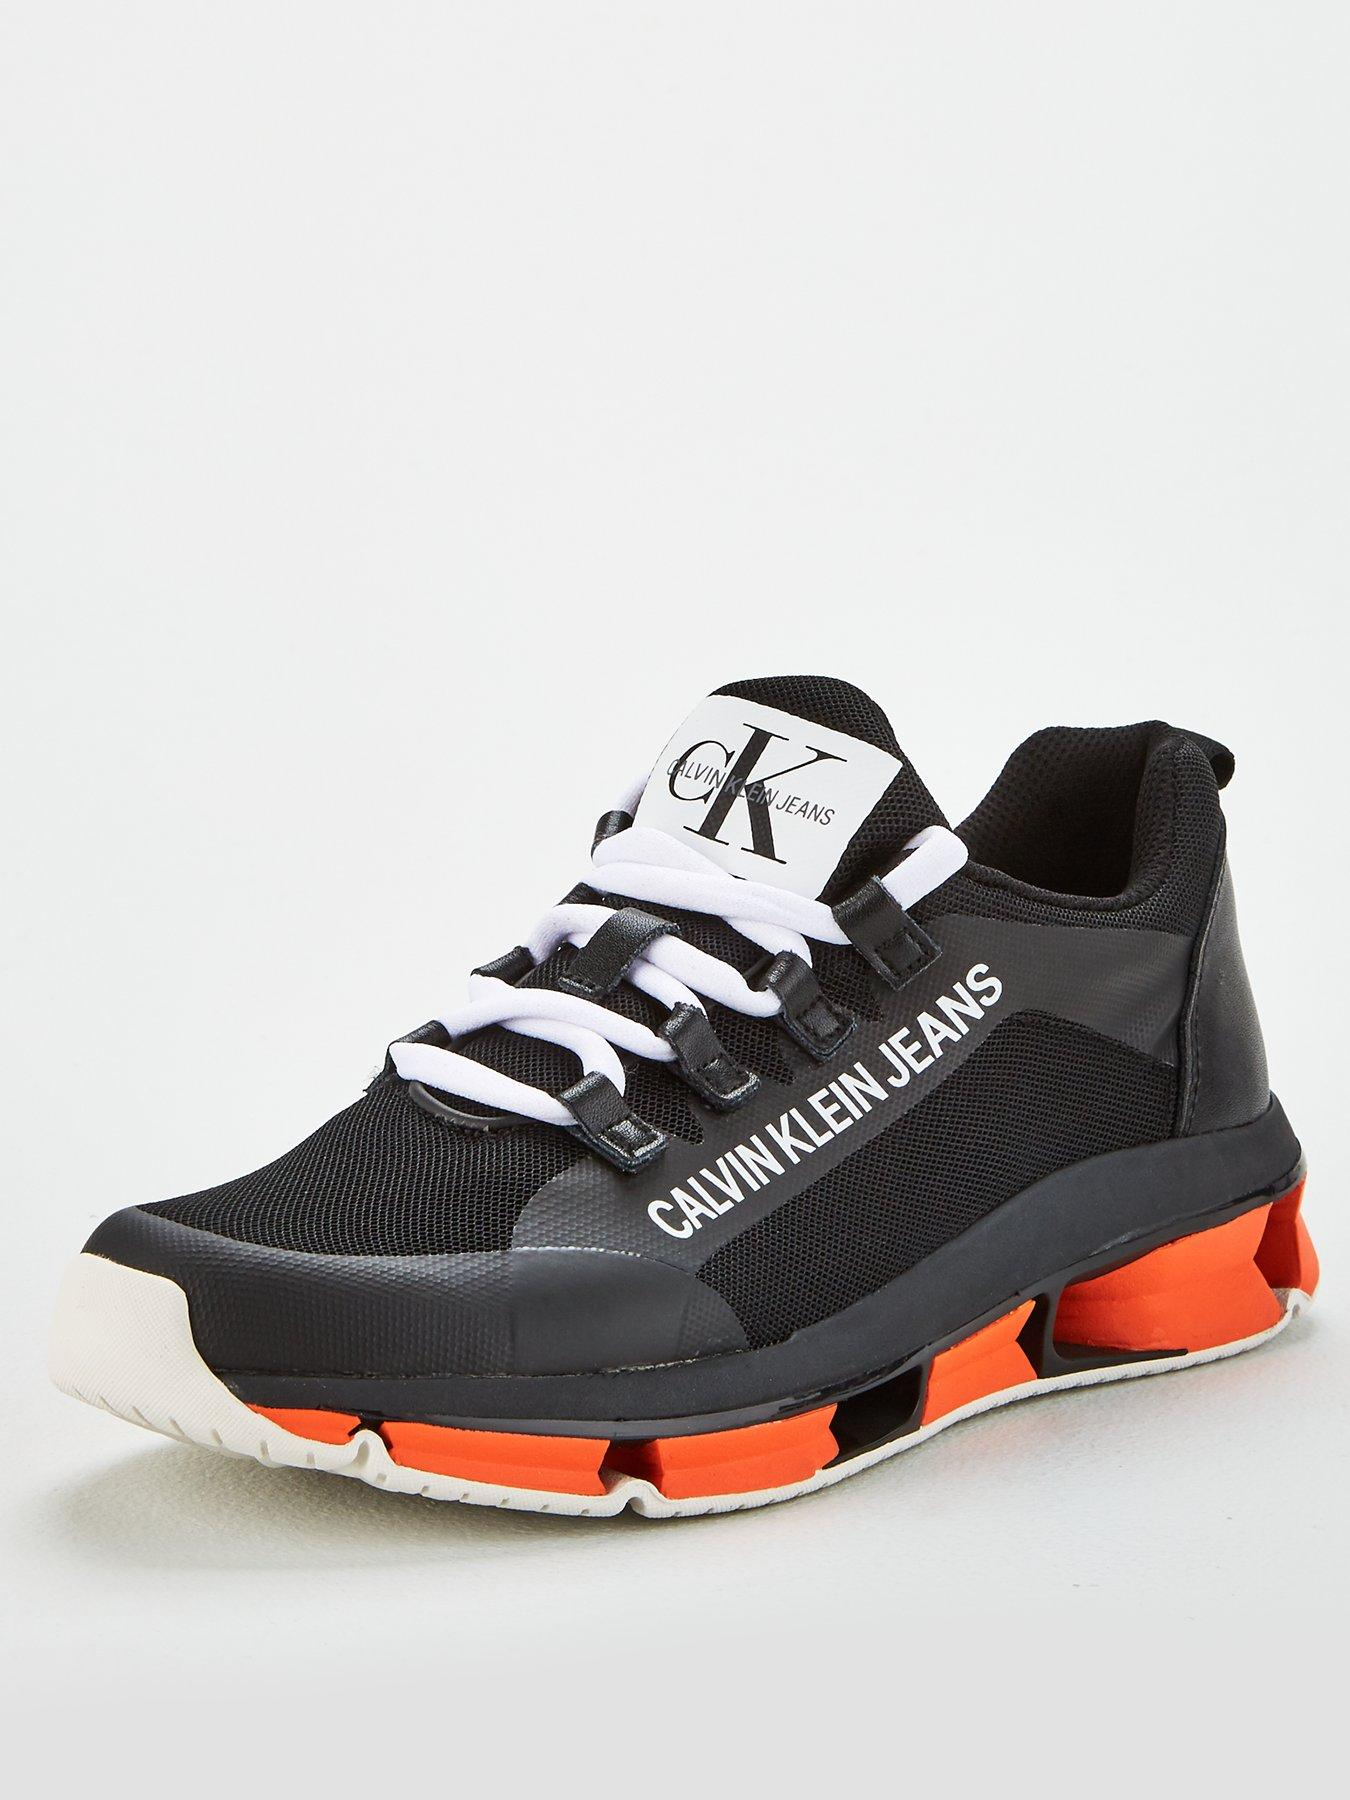 Calvin Sports Leisure Www Shoesamp; KleinMens Okn0Pw